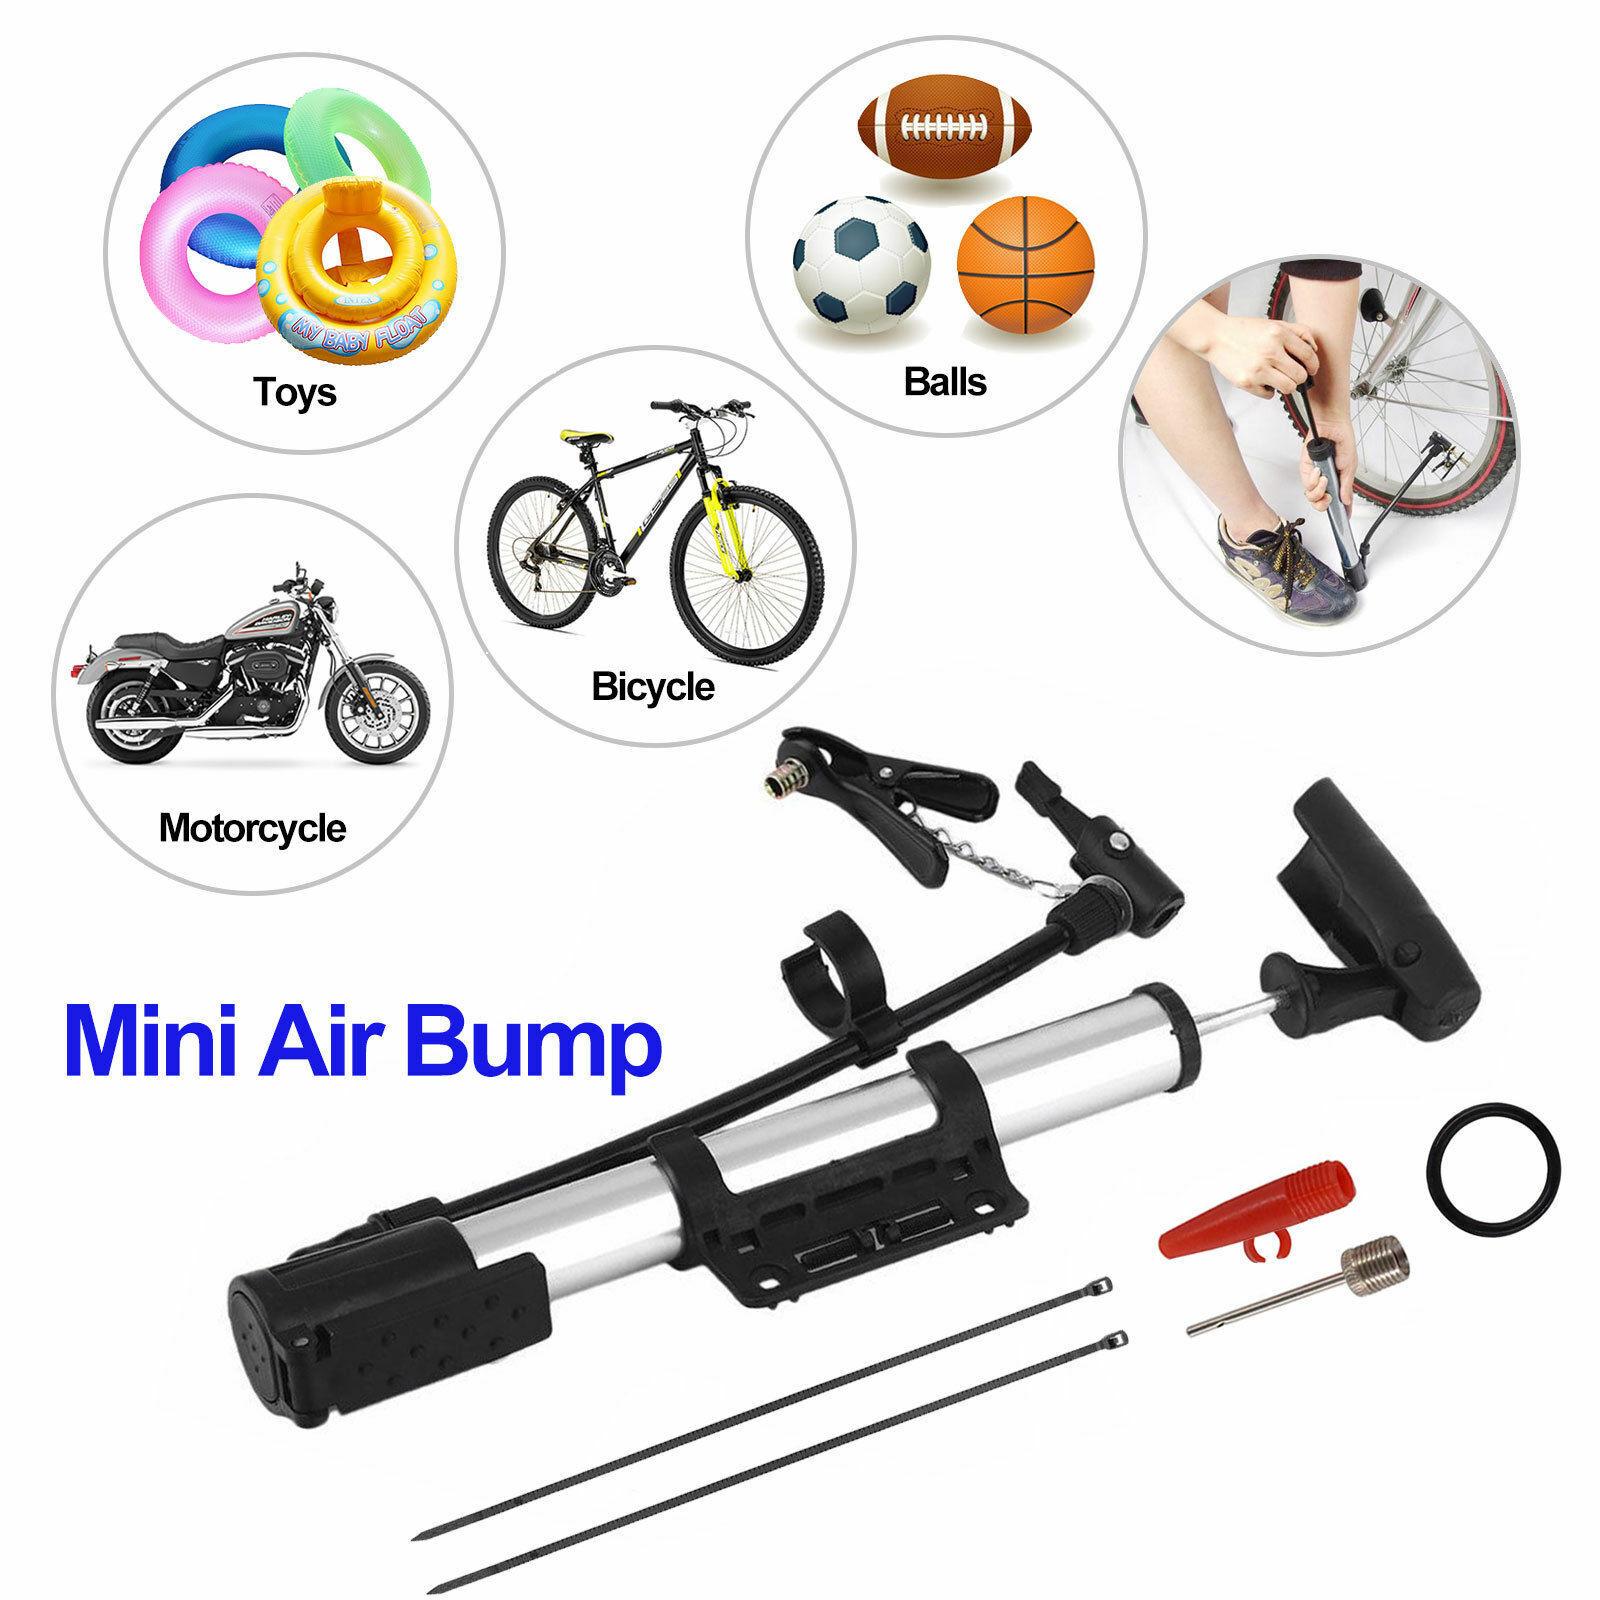 etc. Basketball Football Volleyball ZRM/&E Air Pump Inflator Extension Hose 153mm for Pumping Up Bike Tire